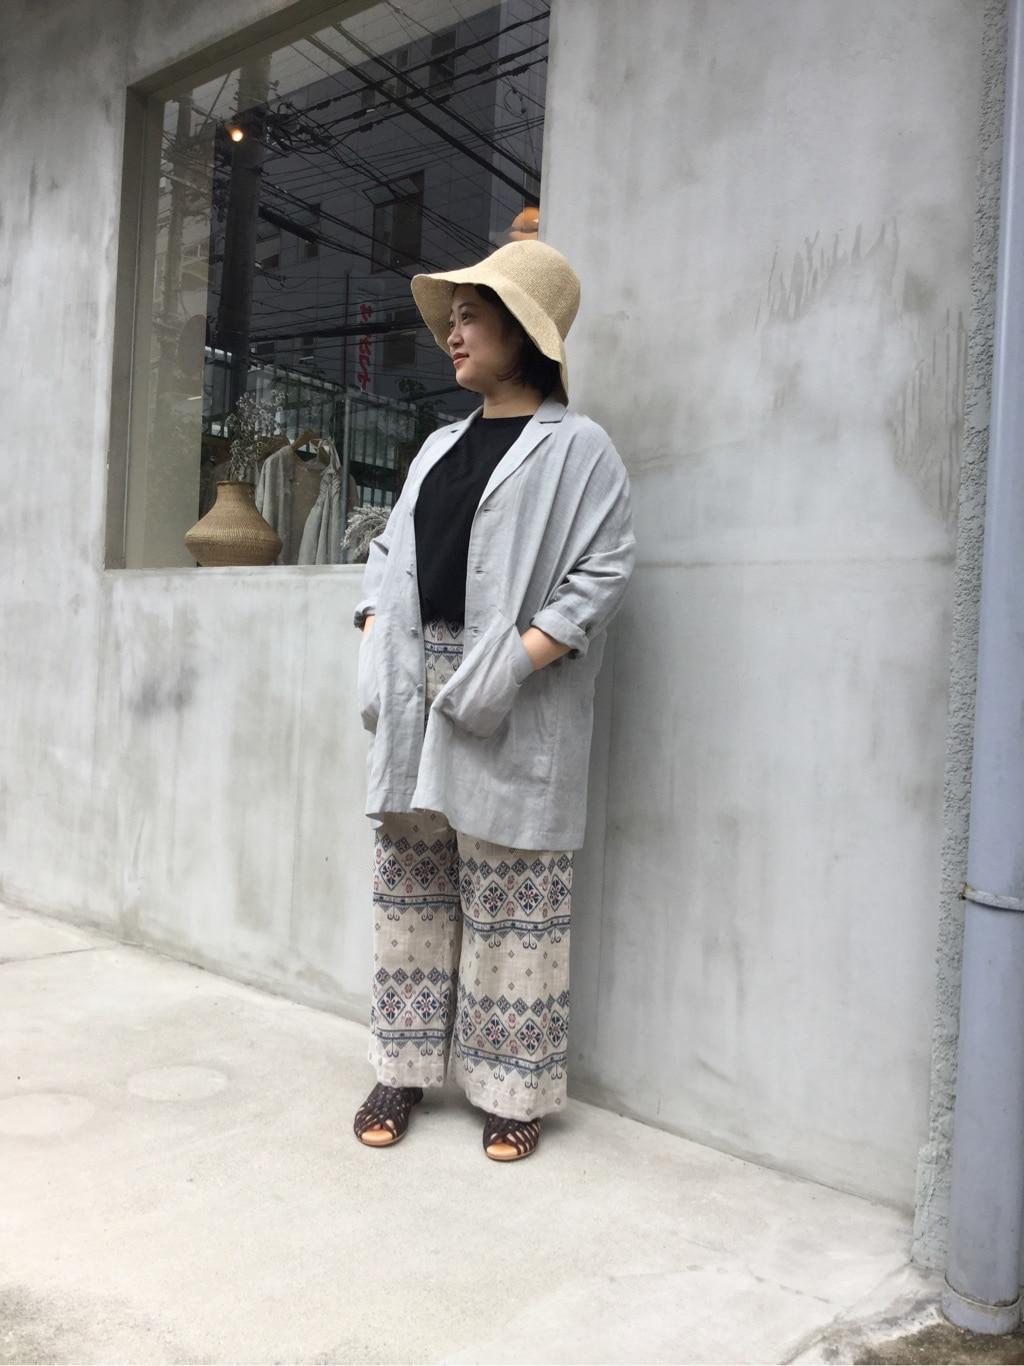 108 yuni / bulle de savon 福岡薬院路面 身長:150cm 2020.07.19